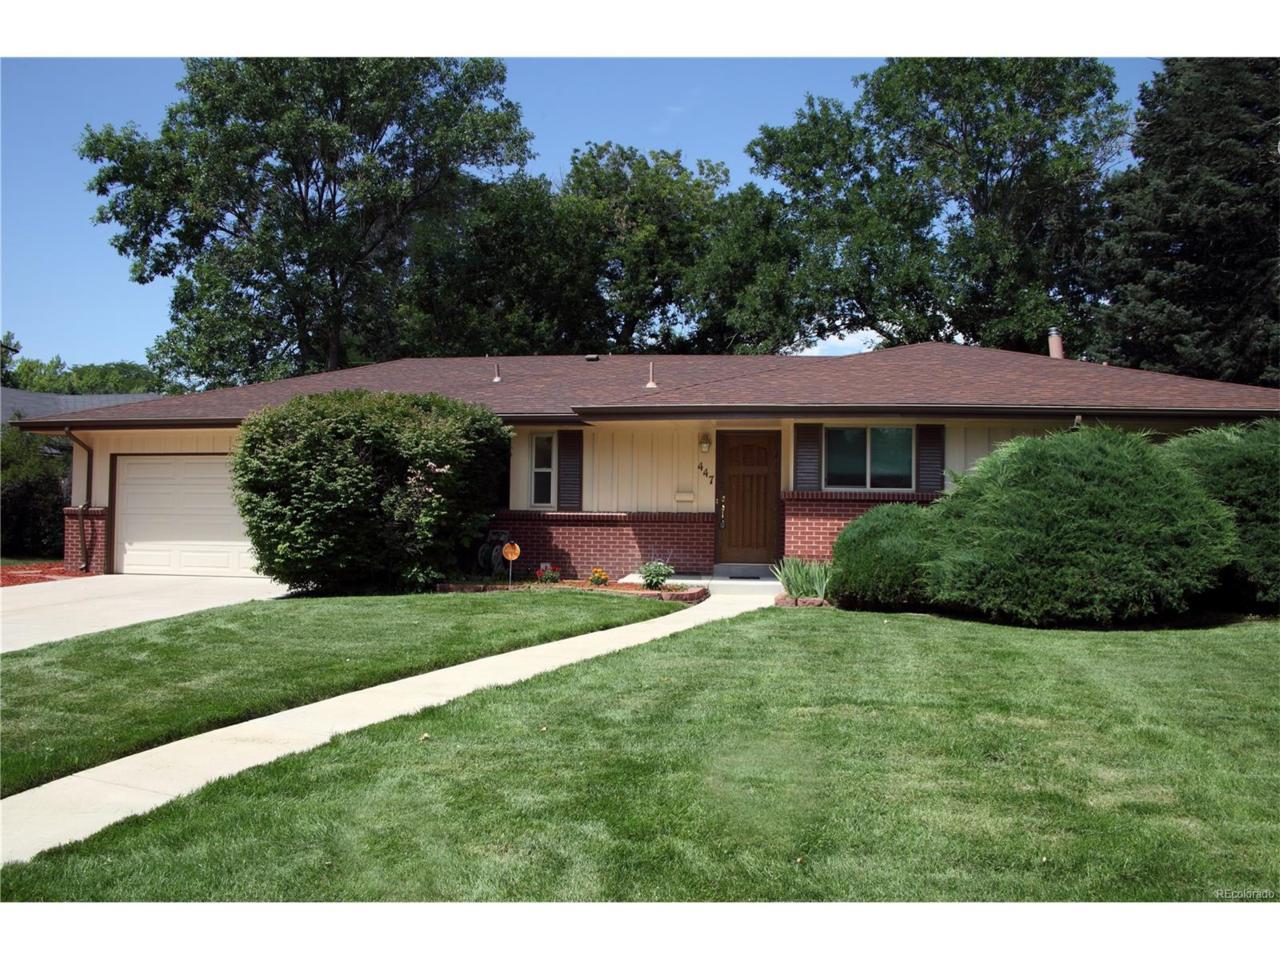 447 S Pontiac Way, Denver, CO 80224 (MLS #9114008) :: 8z Real Estate